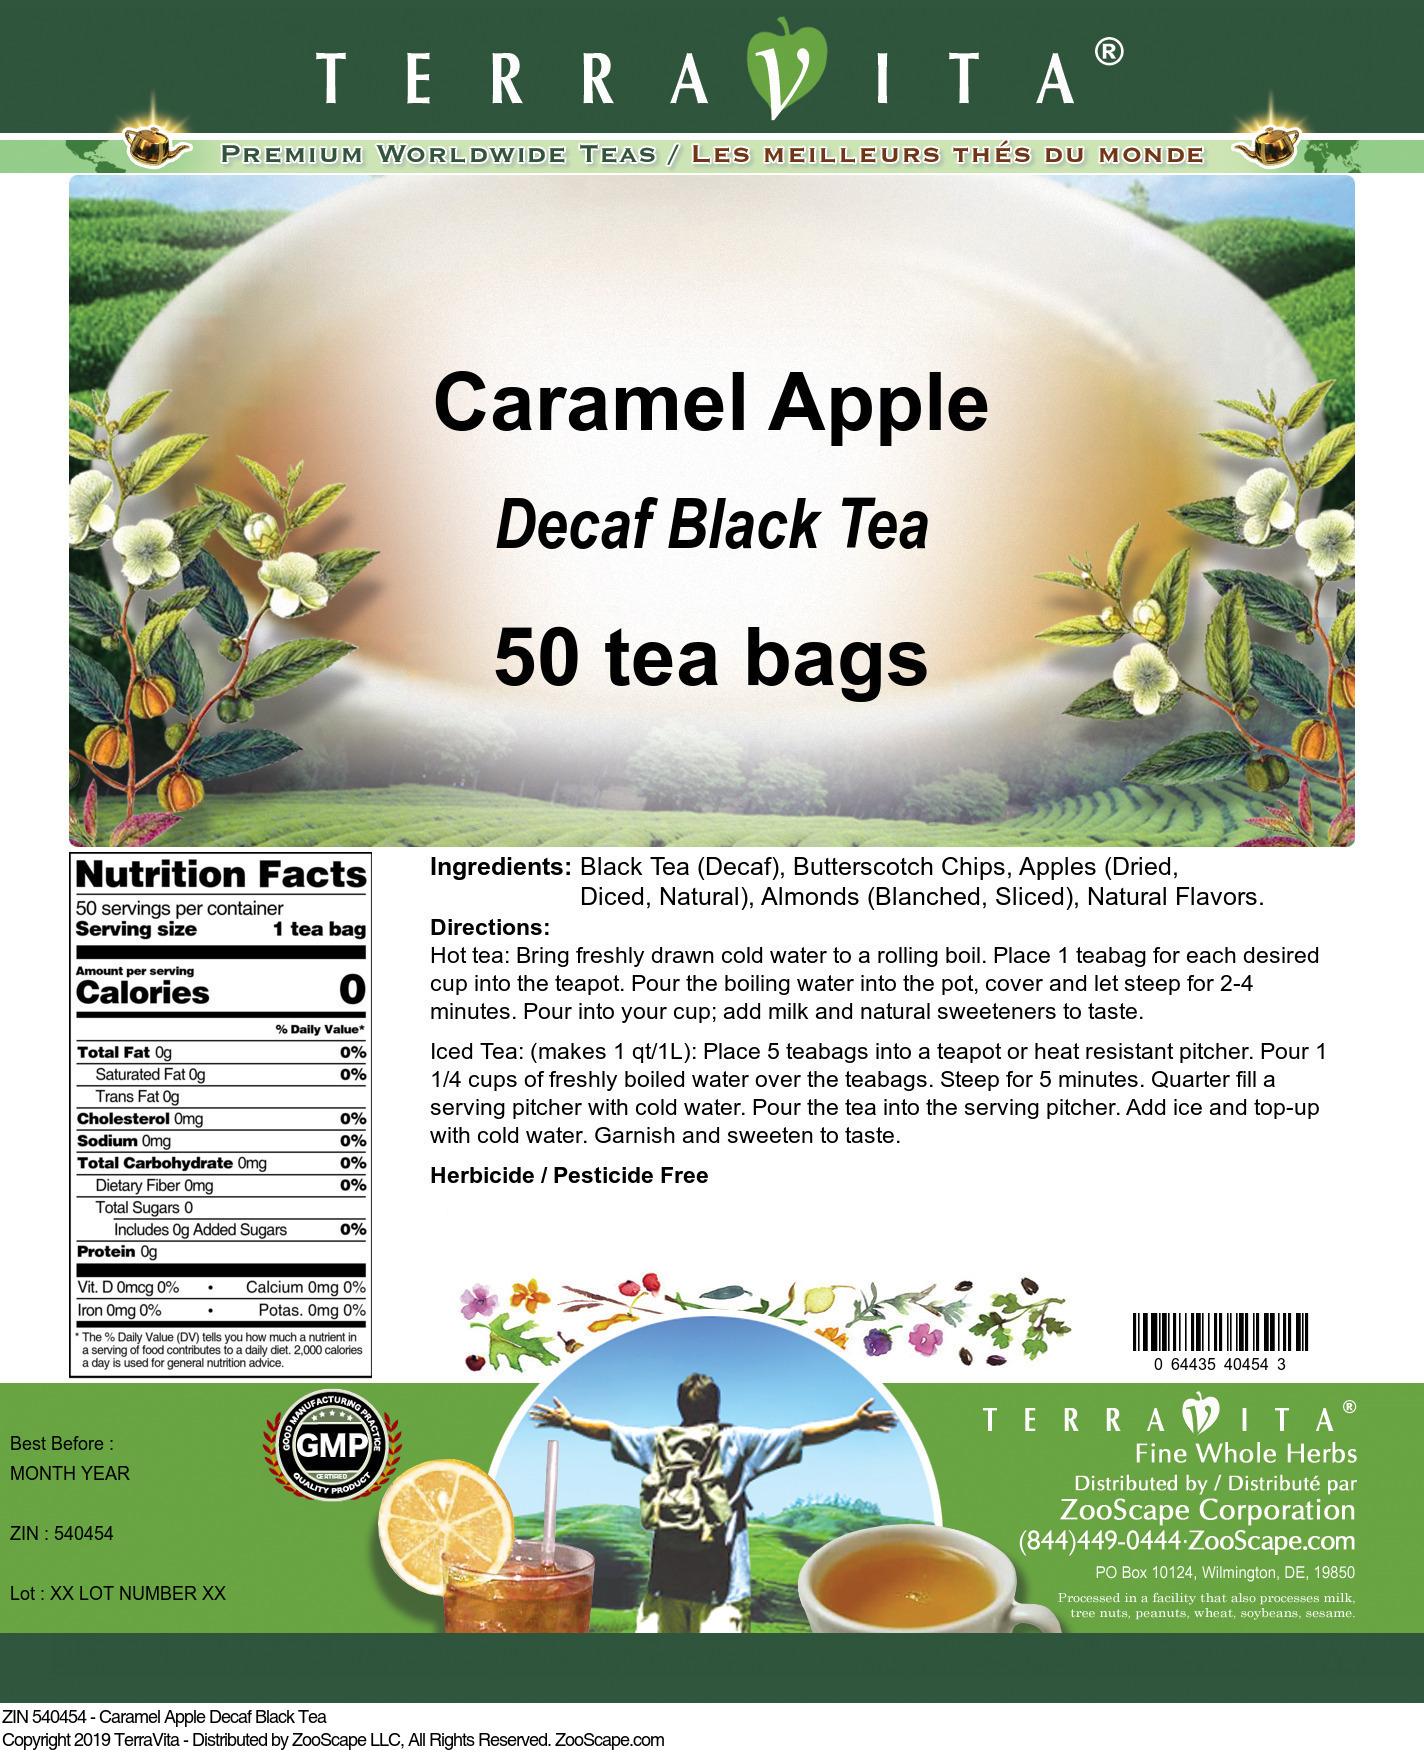 Caramel Apple Decaf Black Tea